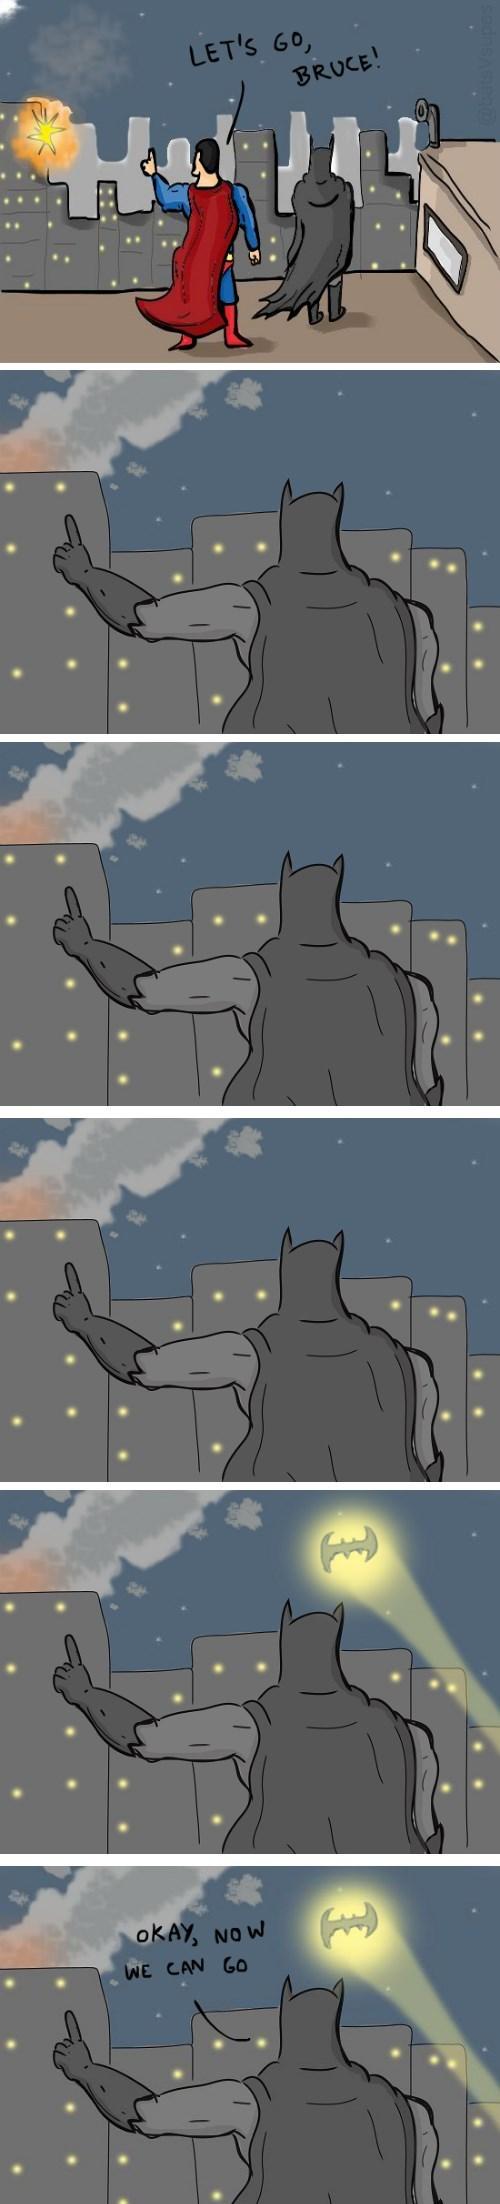 superheroes-batman-dc-wait-bat-signal-superman-web-comic